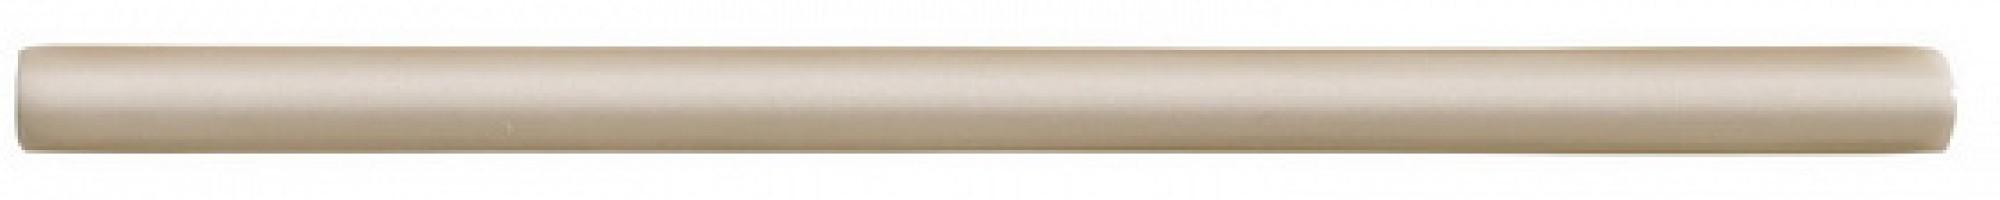 Бордюр Studio ADST5179 Bullnose Trim Silver Sands 0.75x19.8 Adex